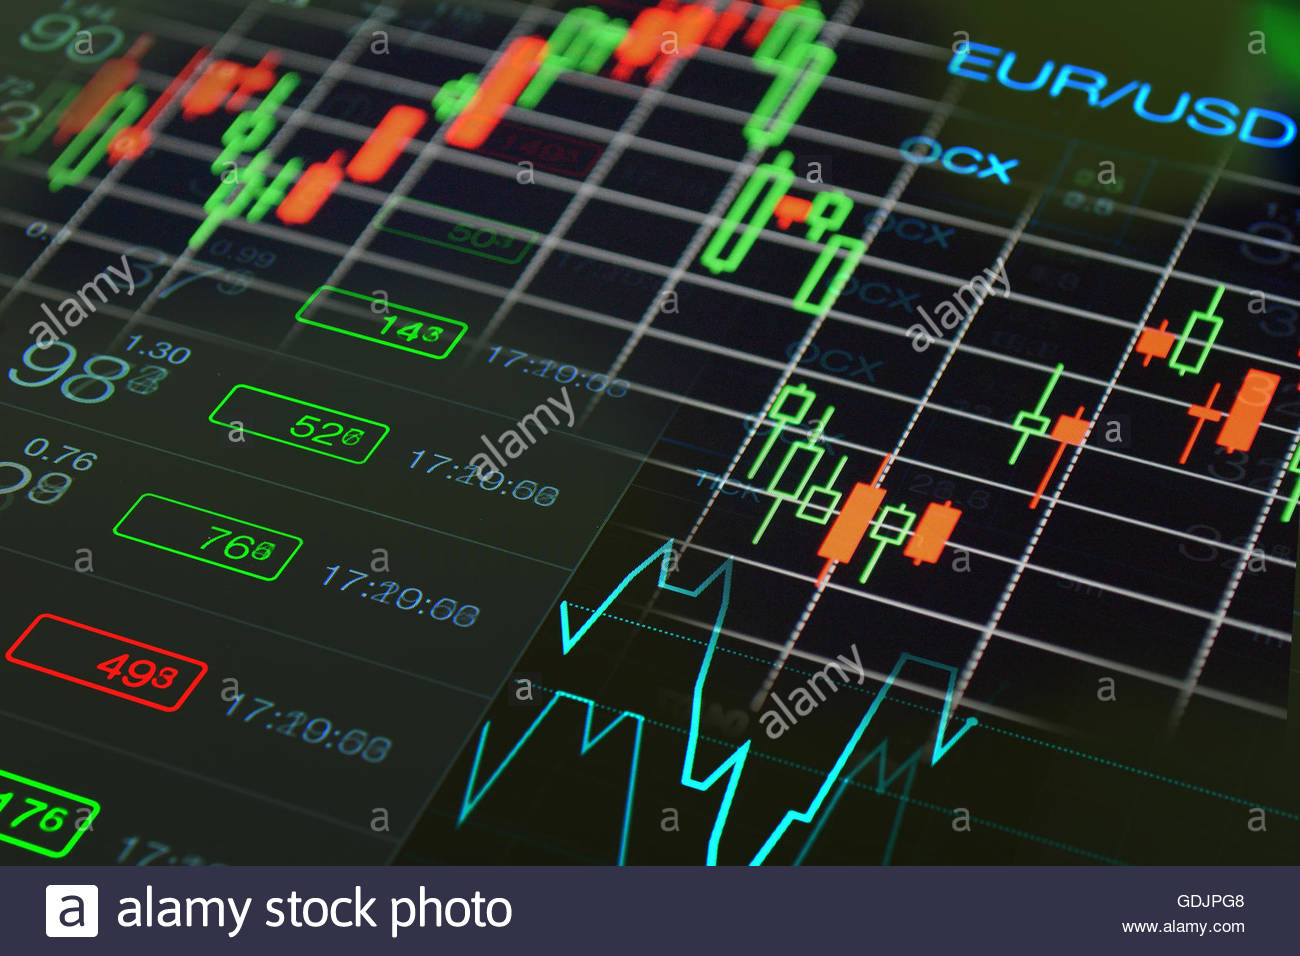 Forex financial business background Stock Photo 111665576   Alamy 1300x956